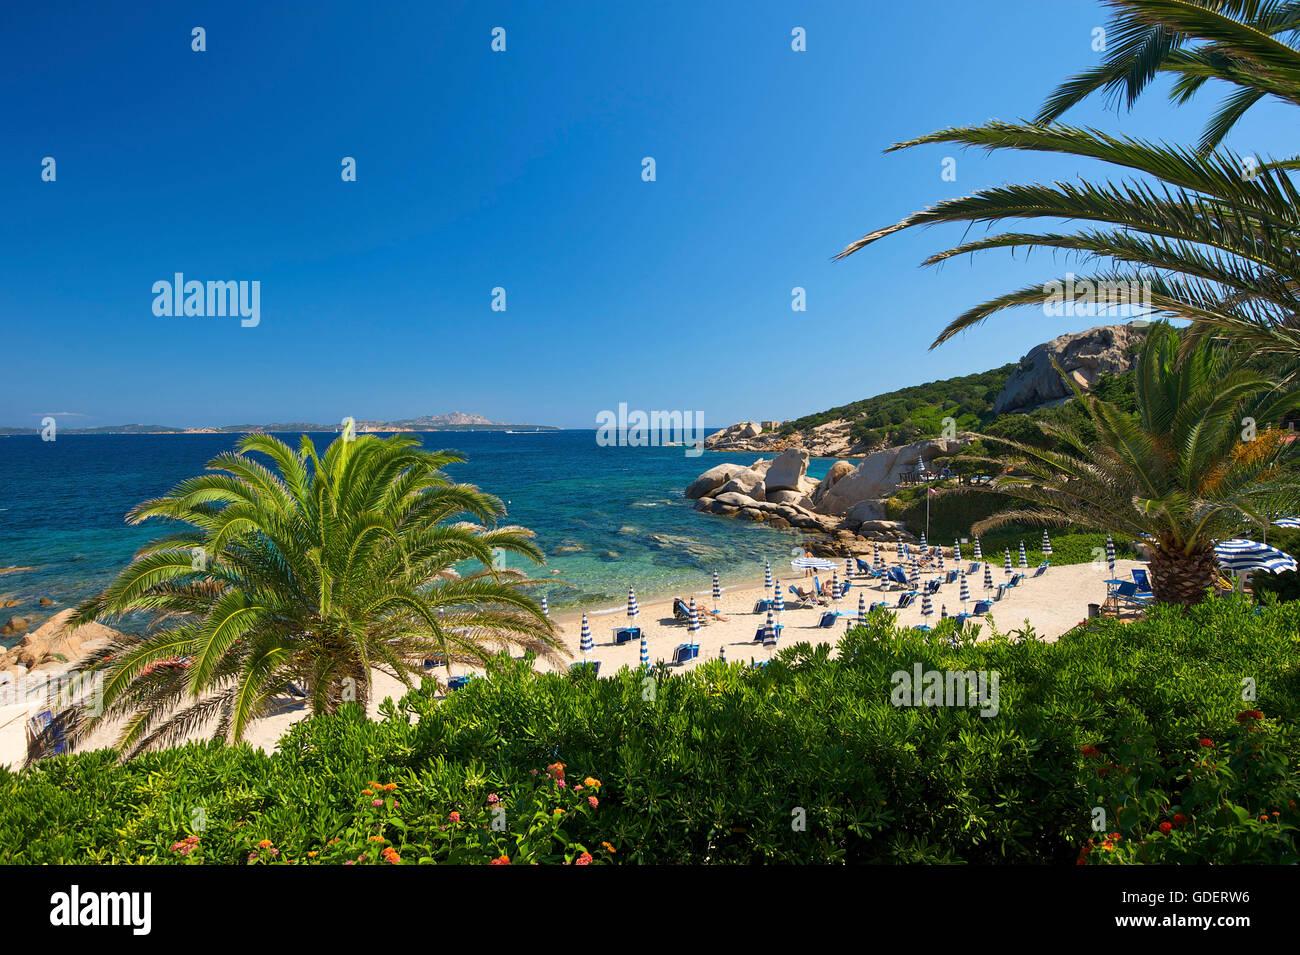 Porto Cervo, Costa Smeralda, Sardinia, Italy - Stock Image